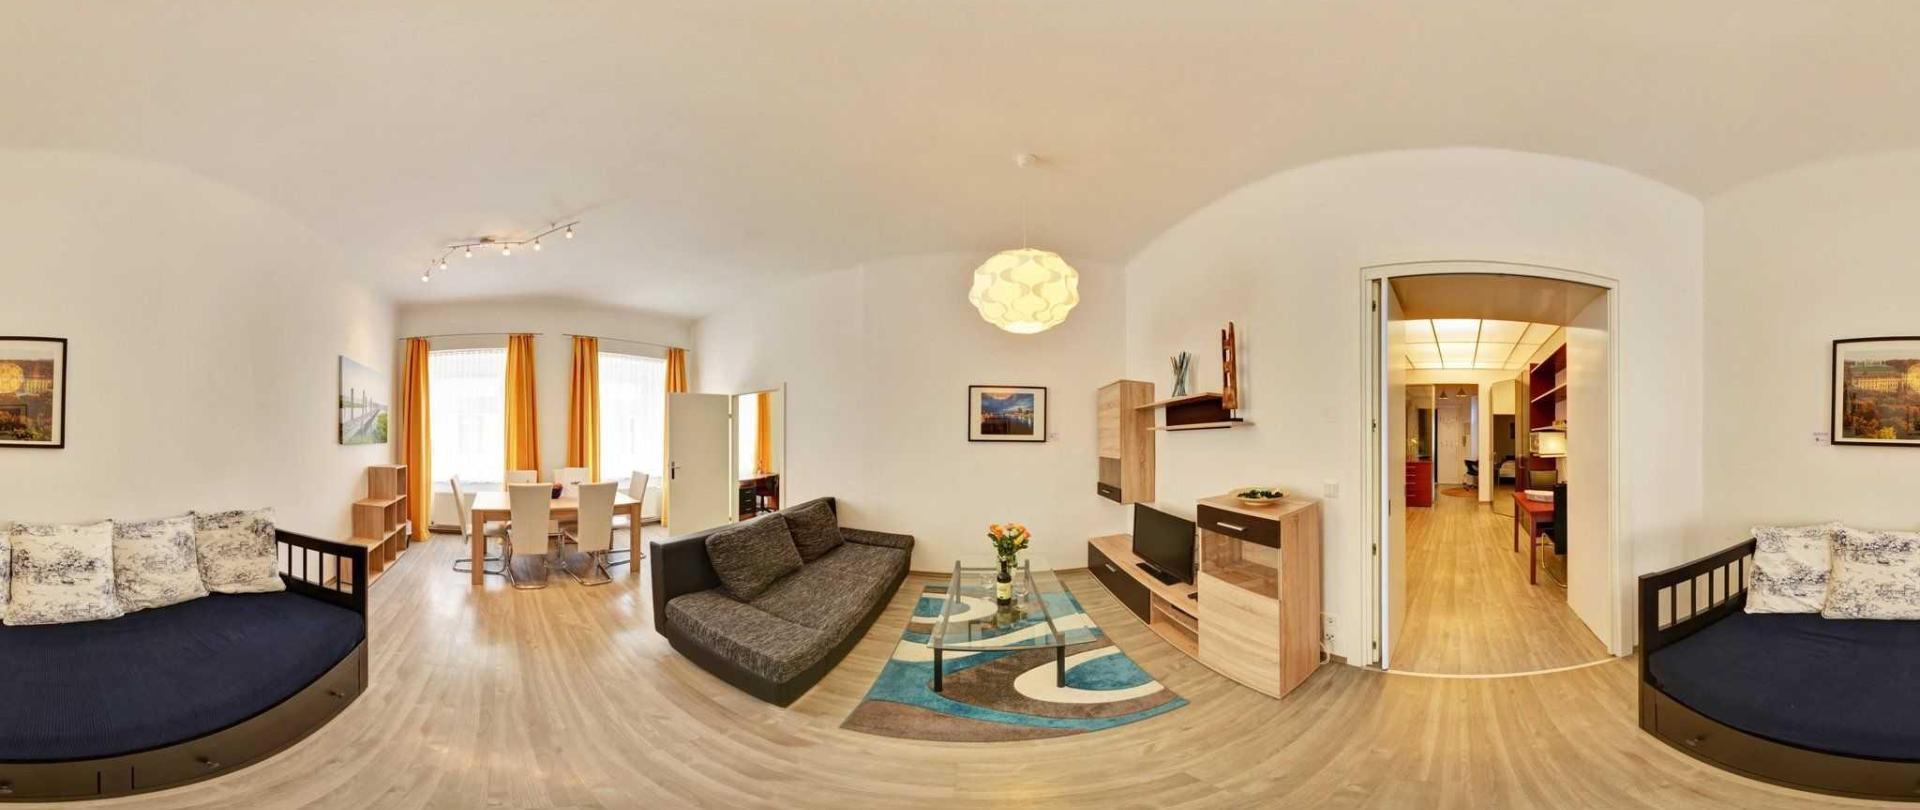 gal_apartments_vienna_zimmer_322_portal.jpg